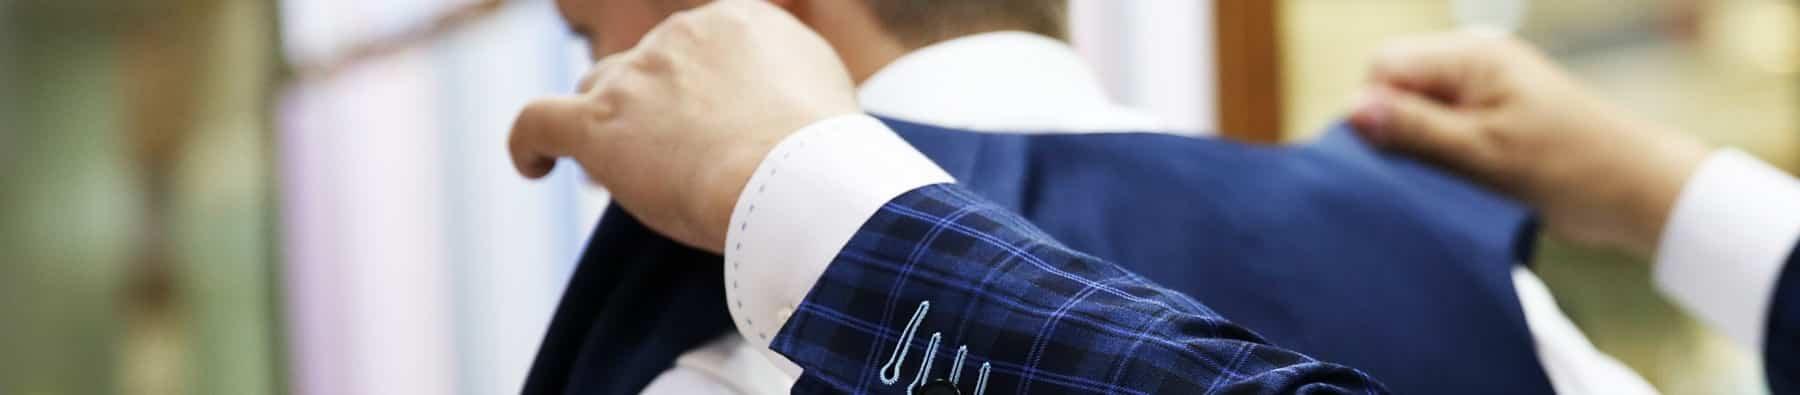 header-waistcoats-min-1.jpg